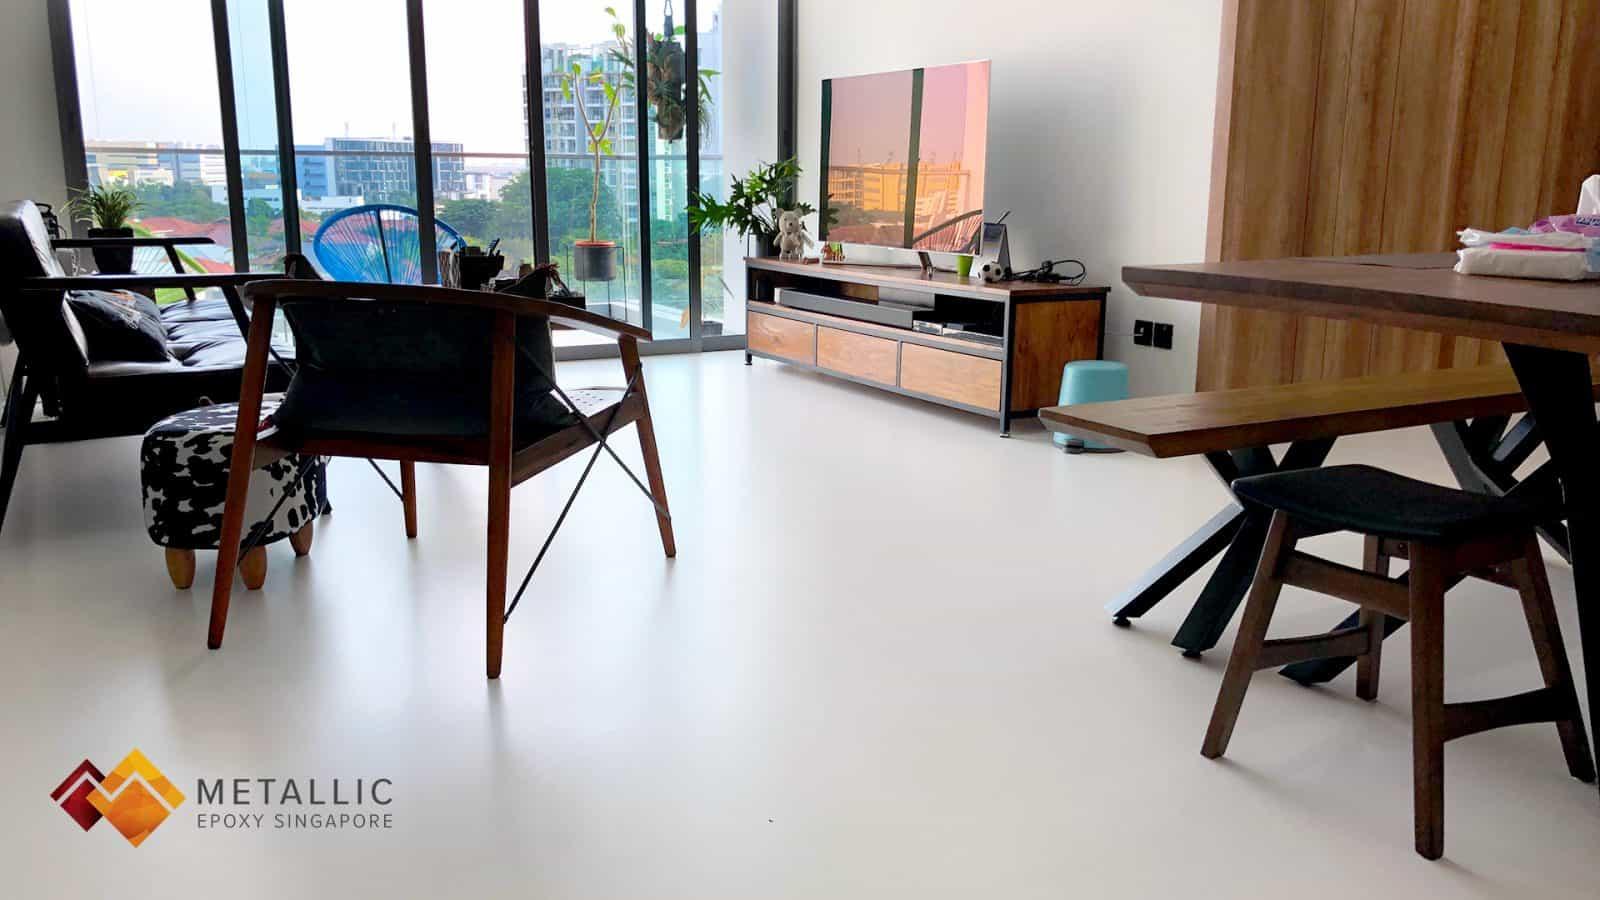 metallic epoxy singapore marble theme floor coated living room